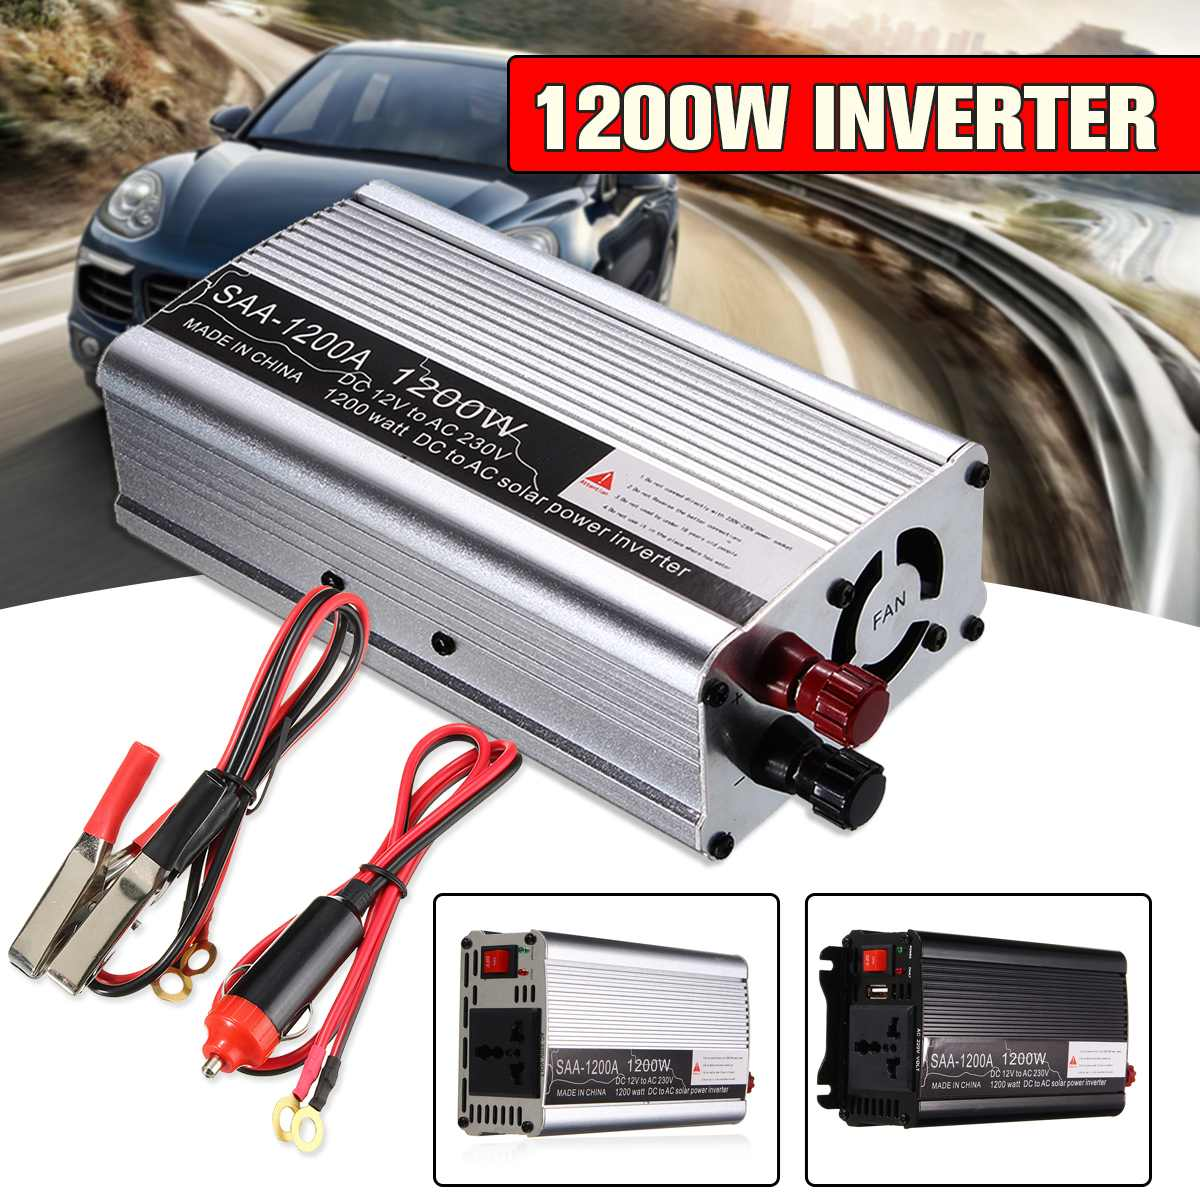 Inverter 1200W Watts USB Power Inverter DC 12 V to AC 220 Volt Car Adapter Charge Converter Modified Sine Wave Transformer